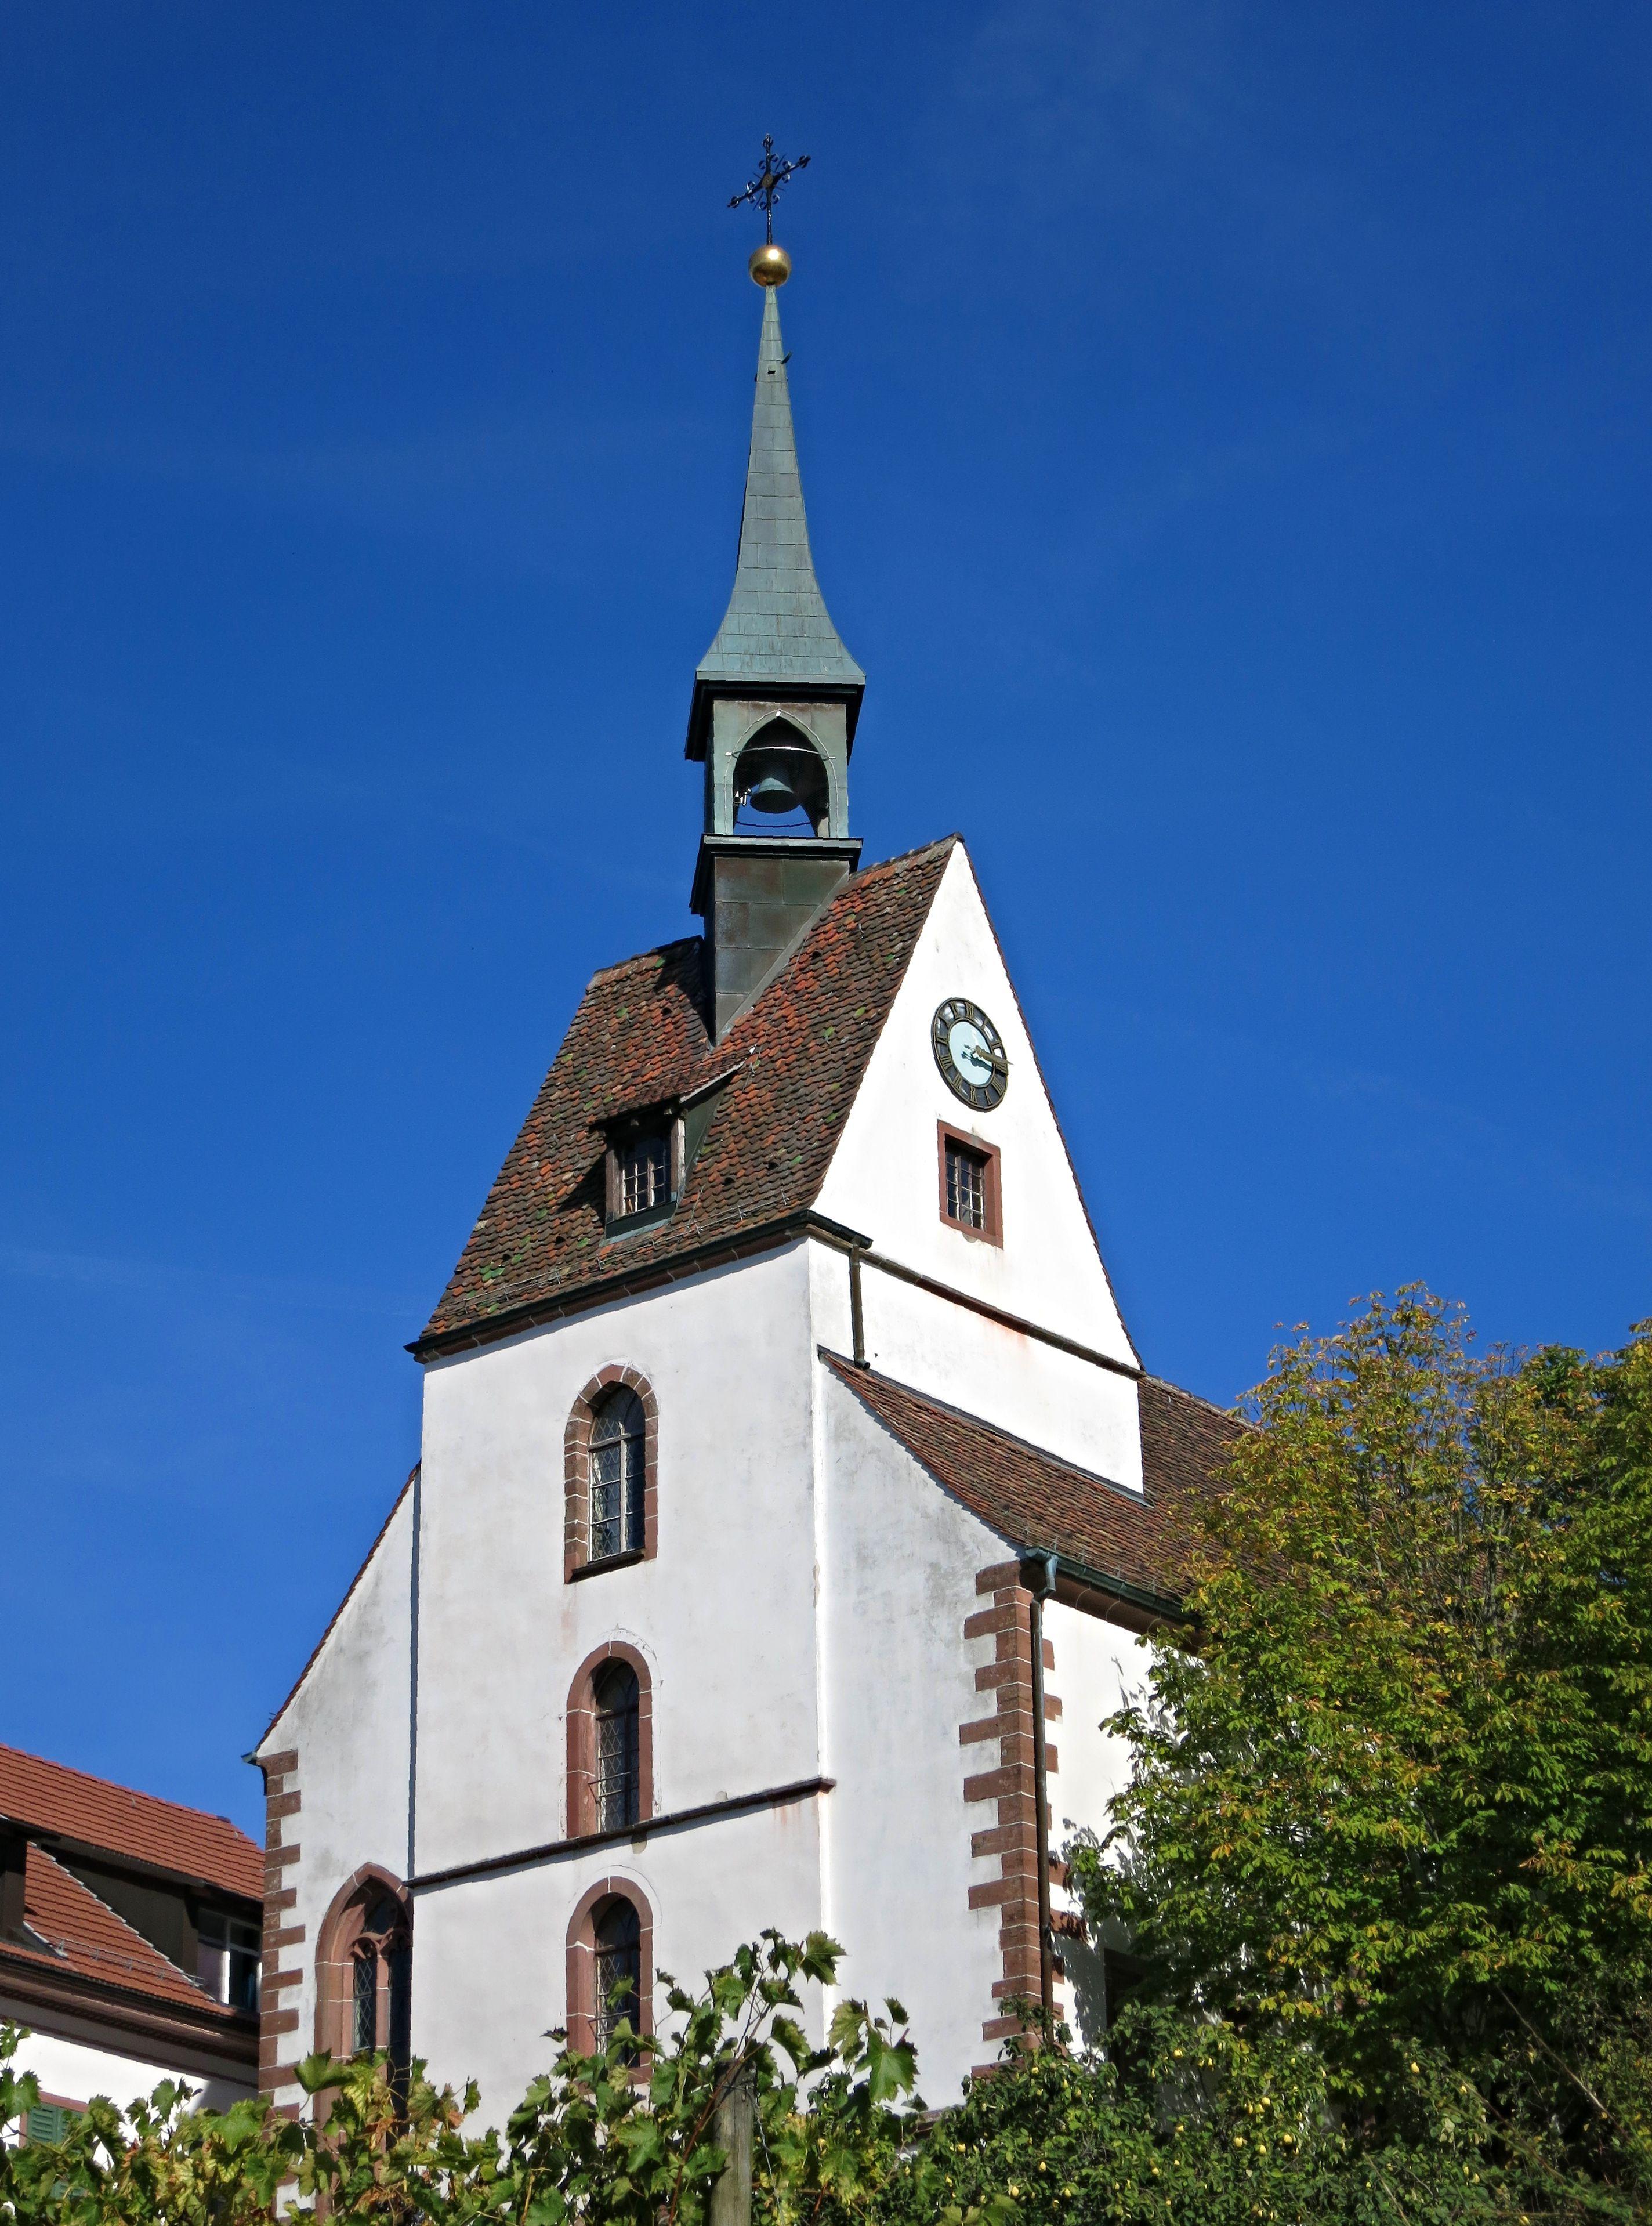 Kirche chrischona bettingen foundation sports betting arbitrage reddit nba